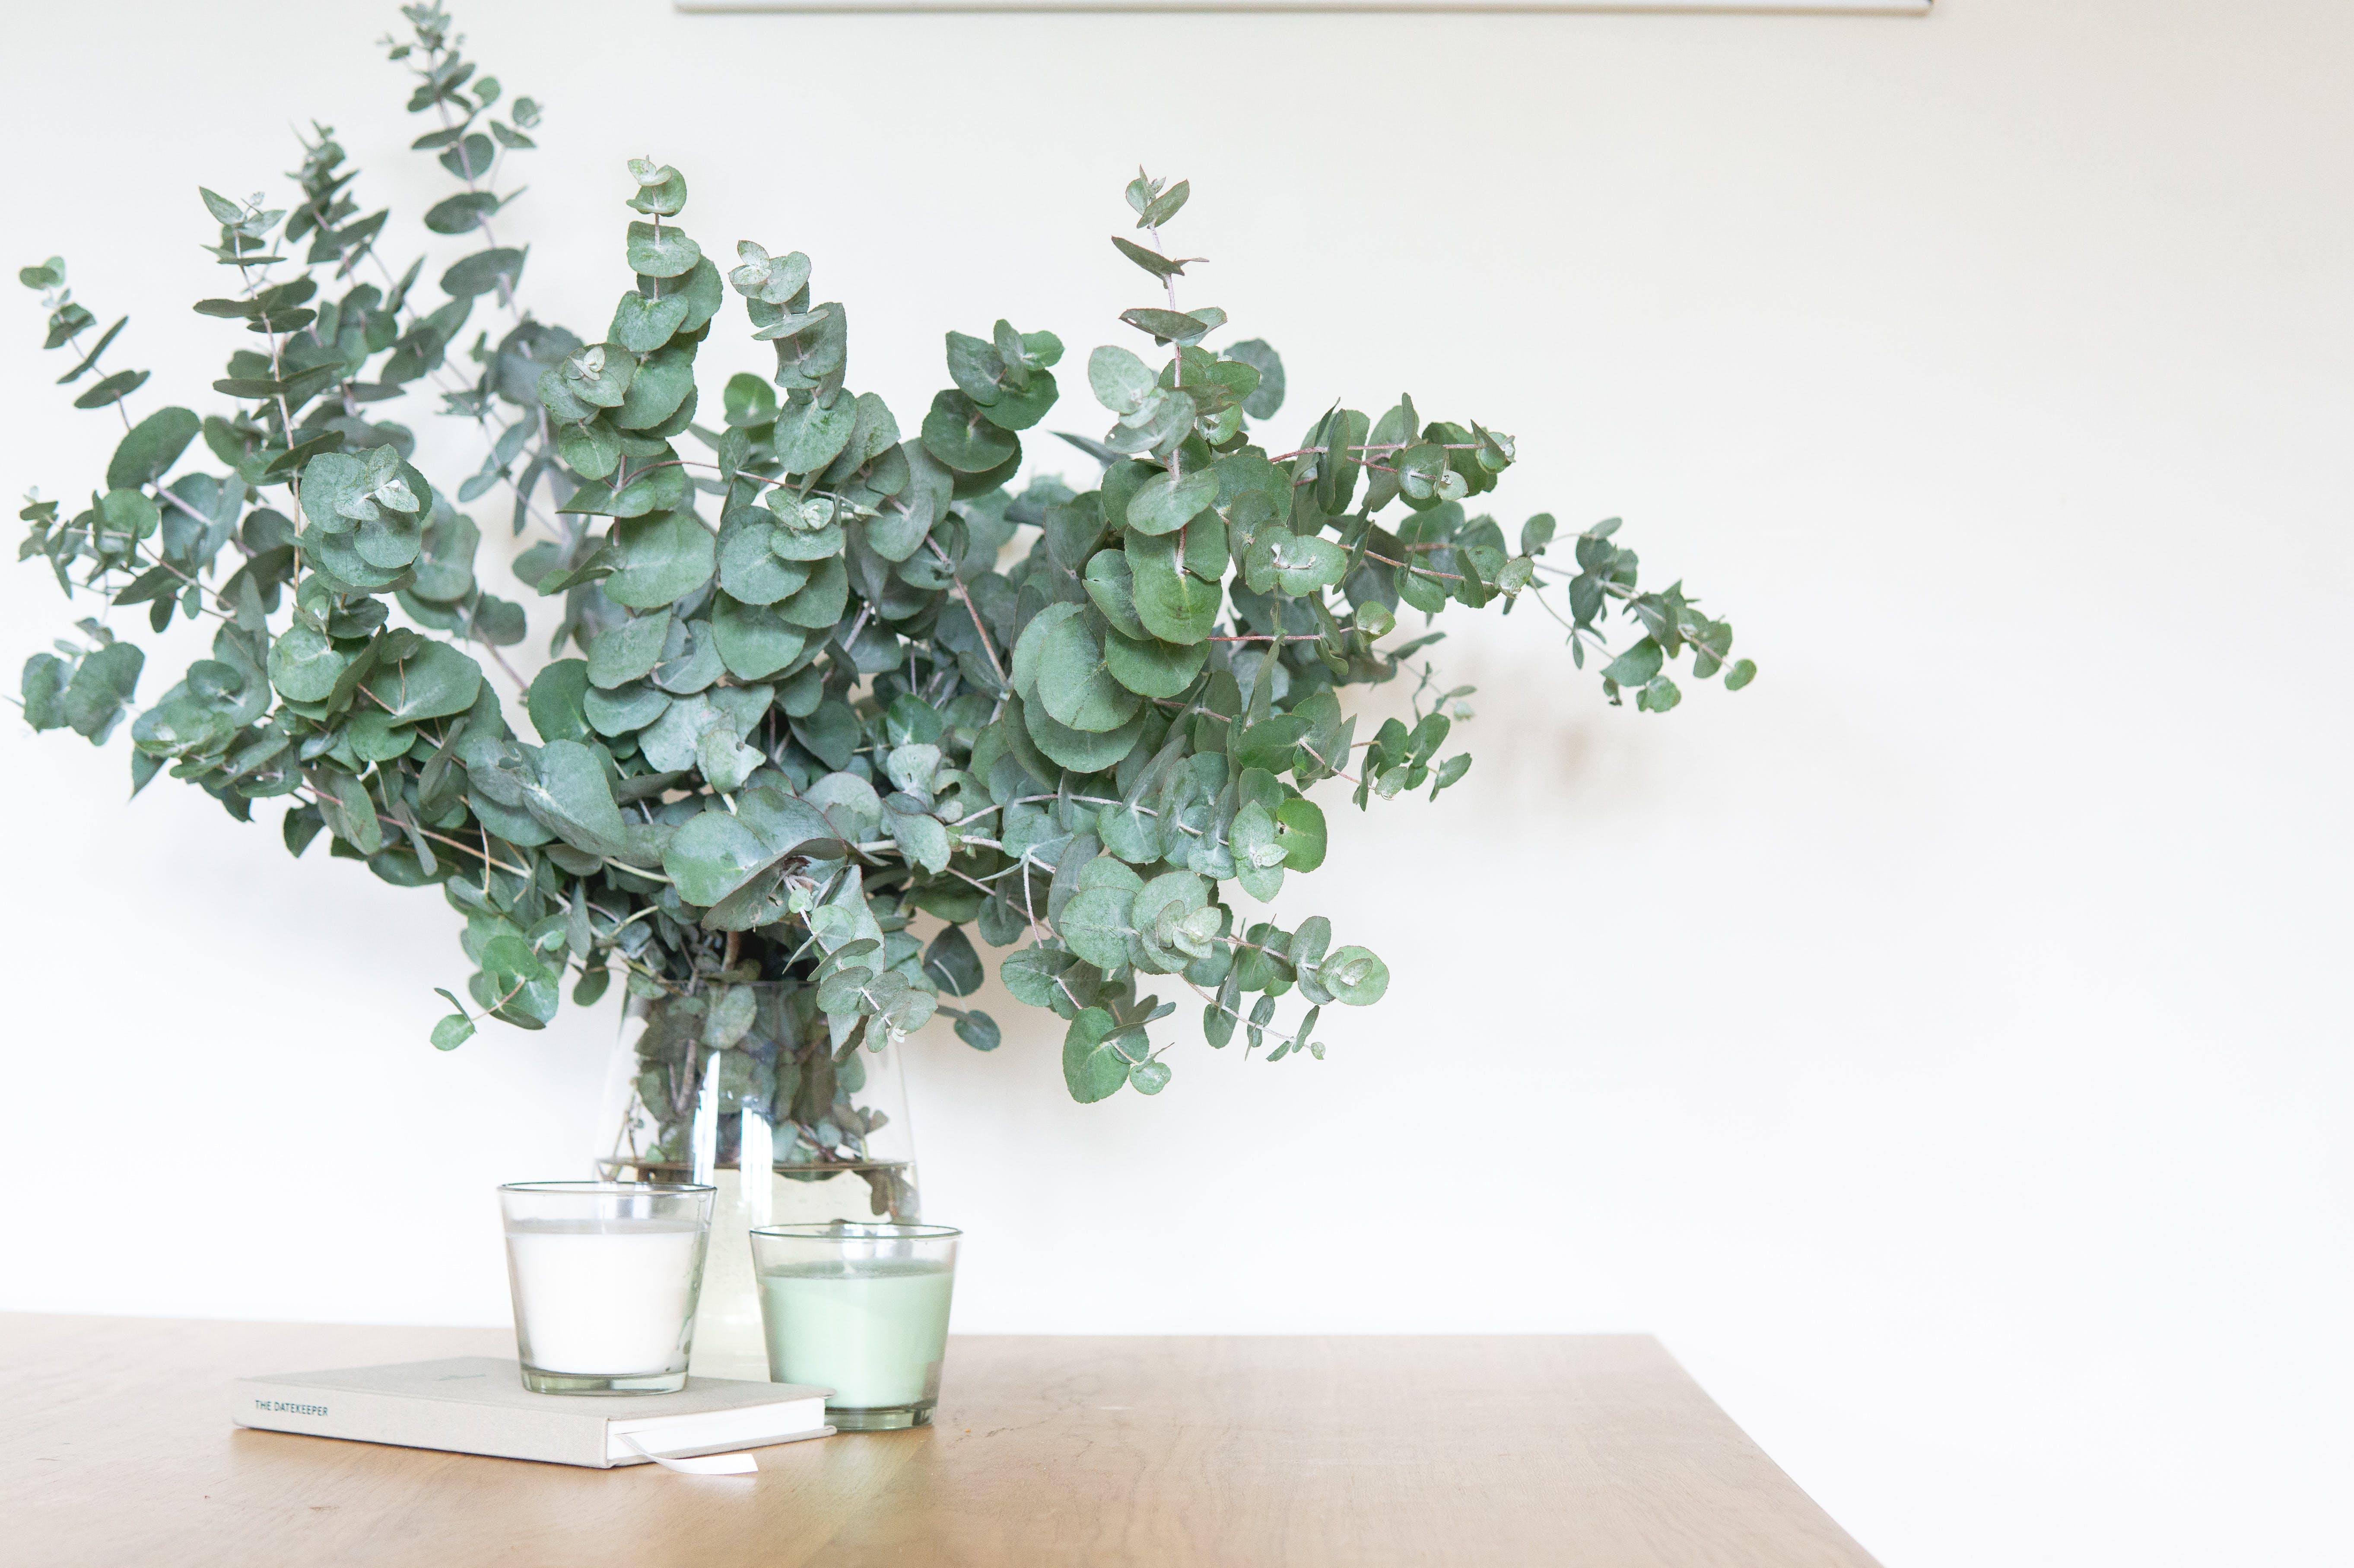 Green-leafed Indoor Plant